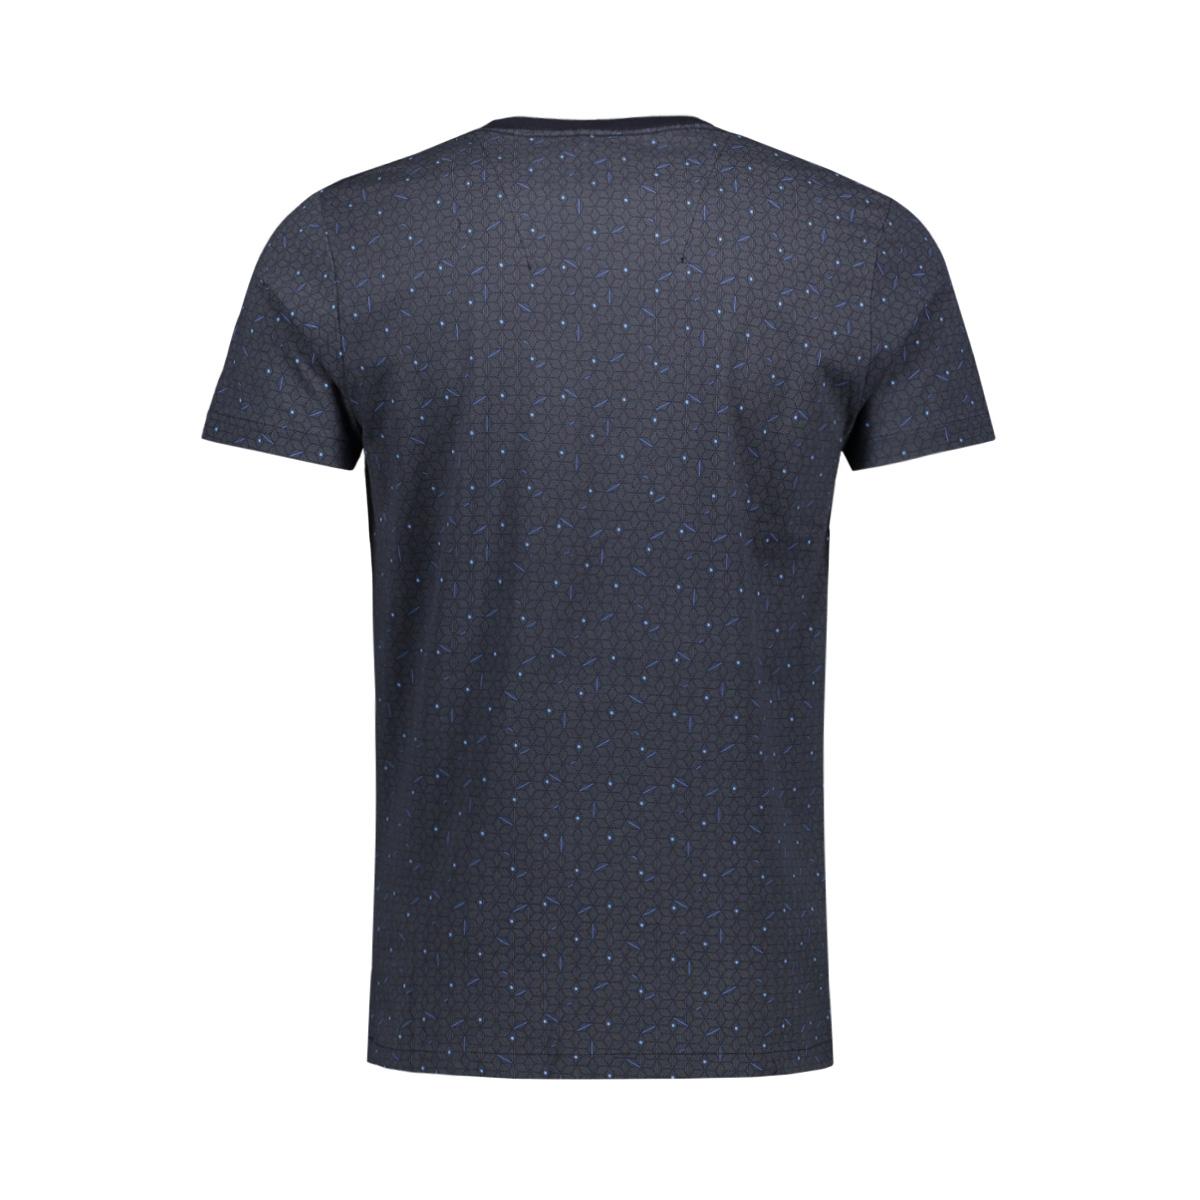 t shirt met all over print g91010 garcia t-shirt 292 dark moon